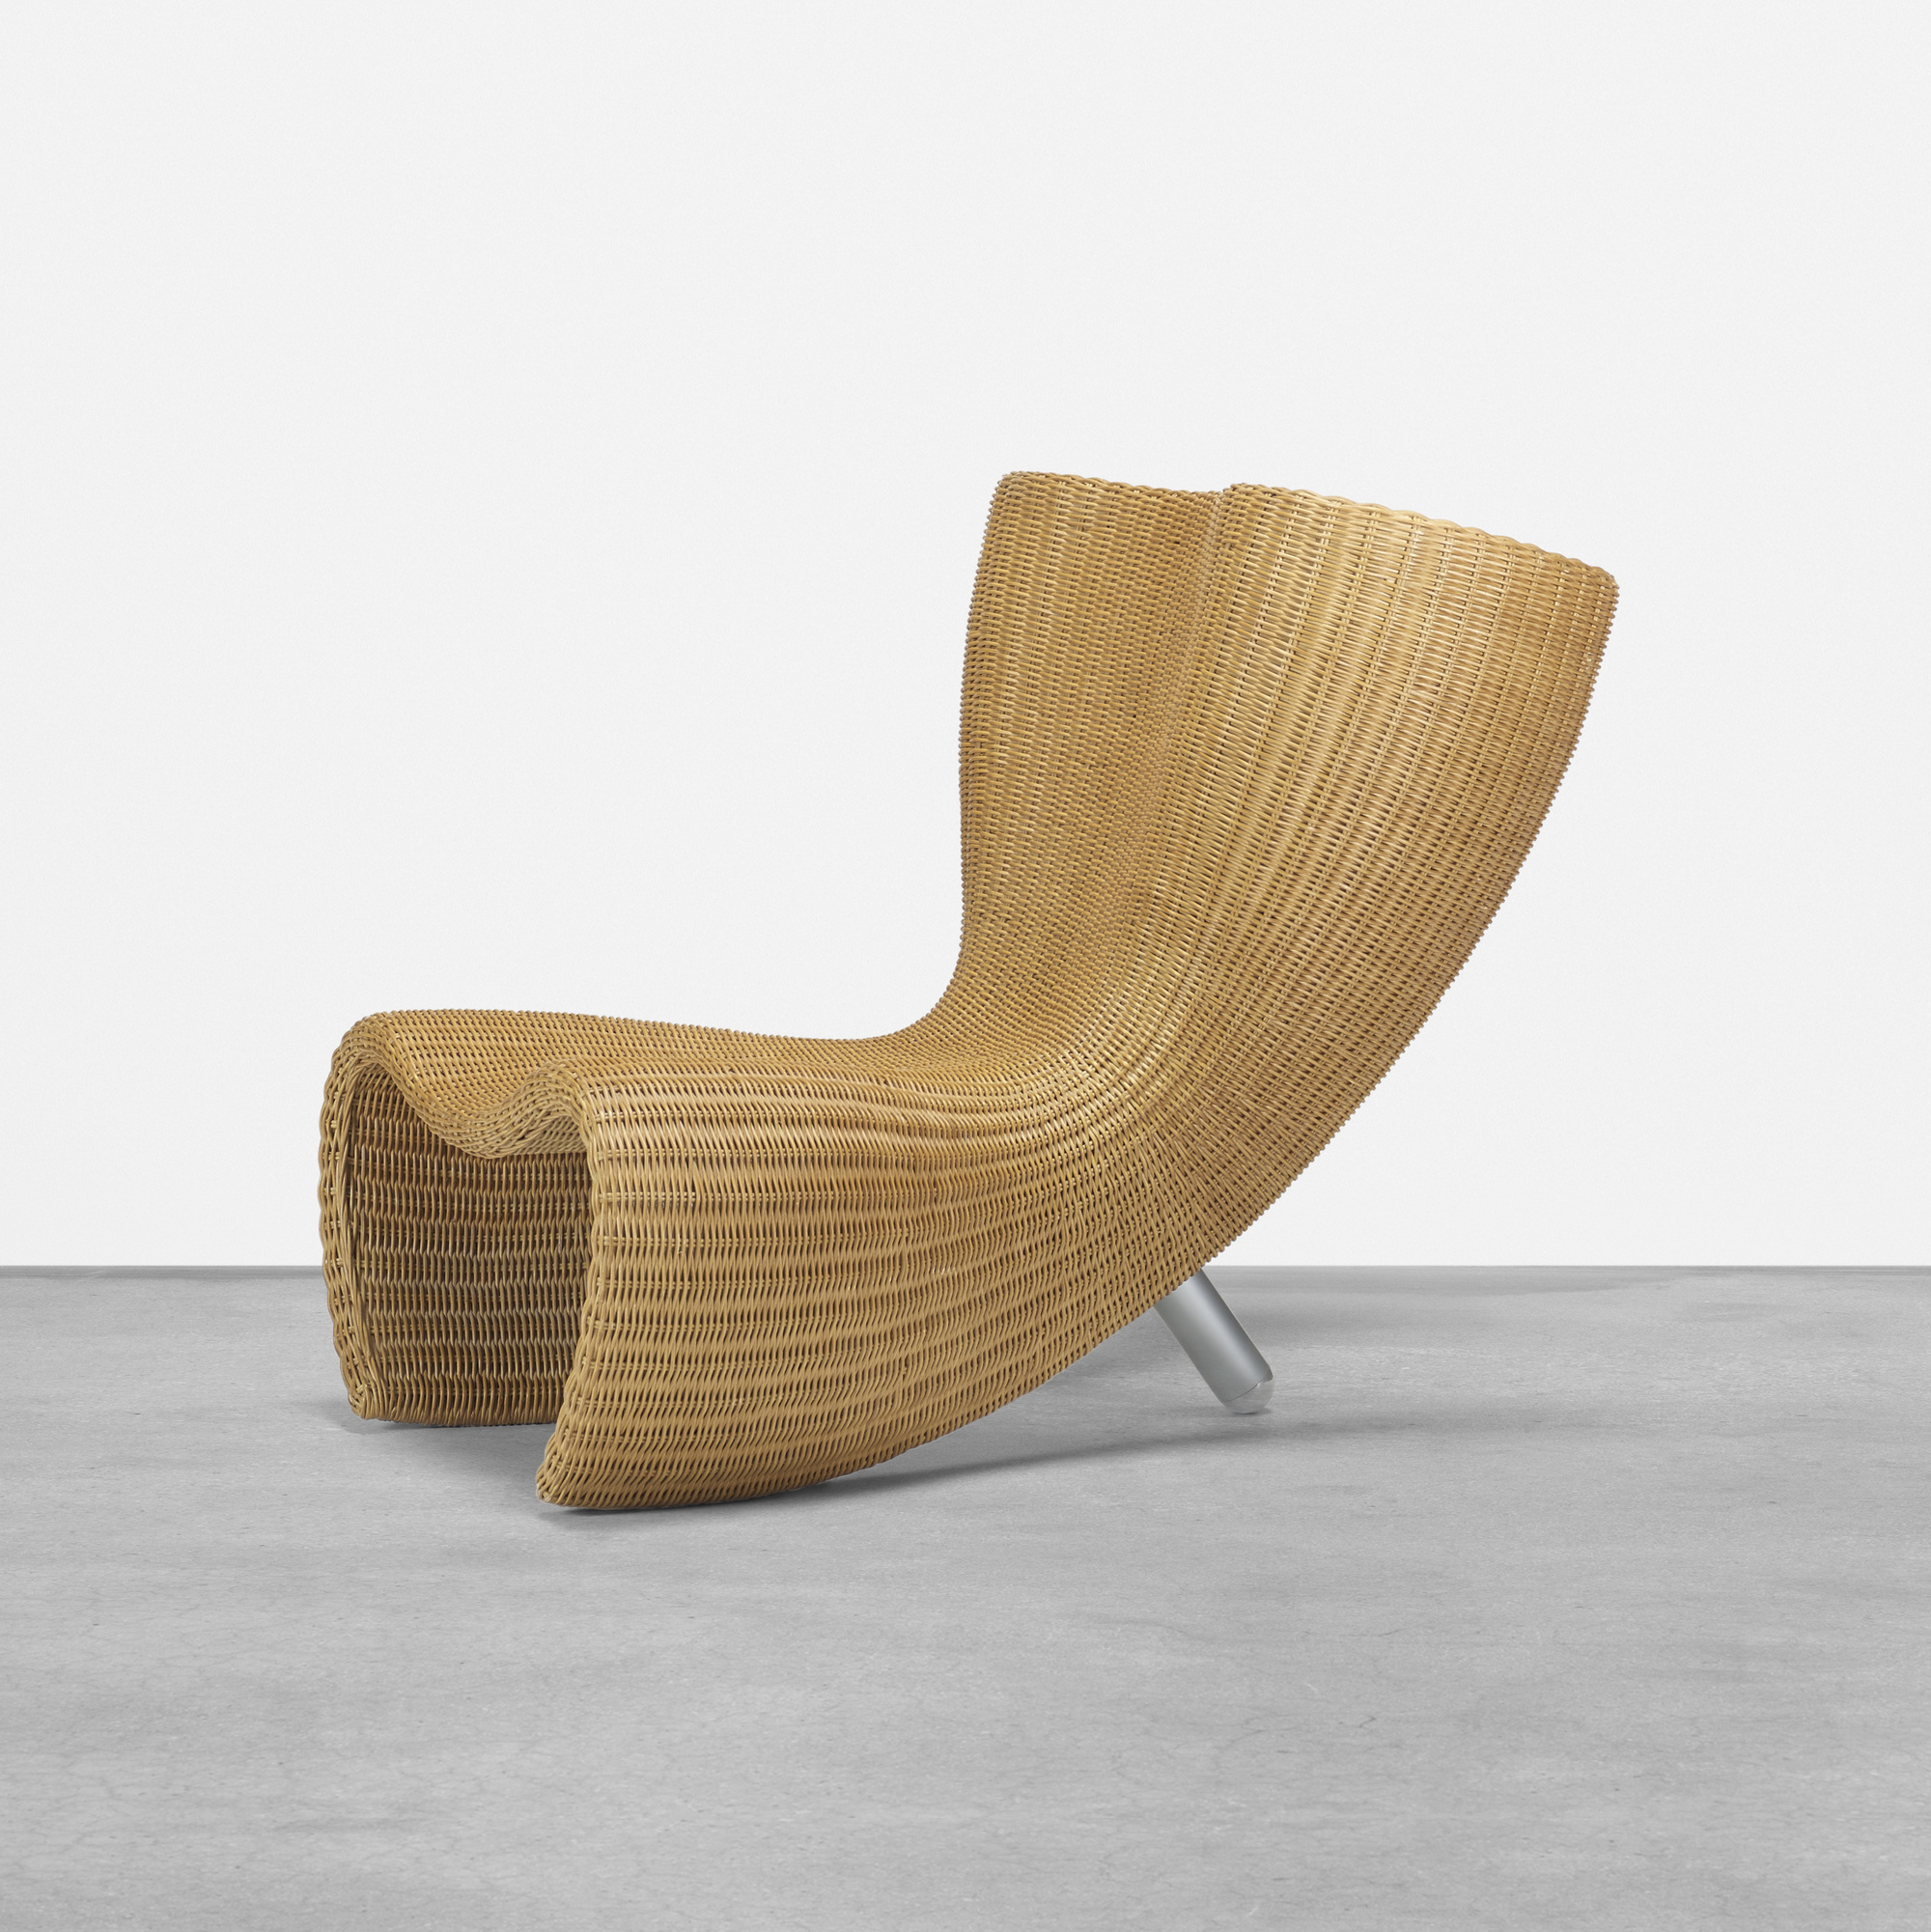 225 Marc Newson Wicker chair Art Design 26 February 2015